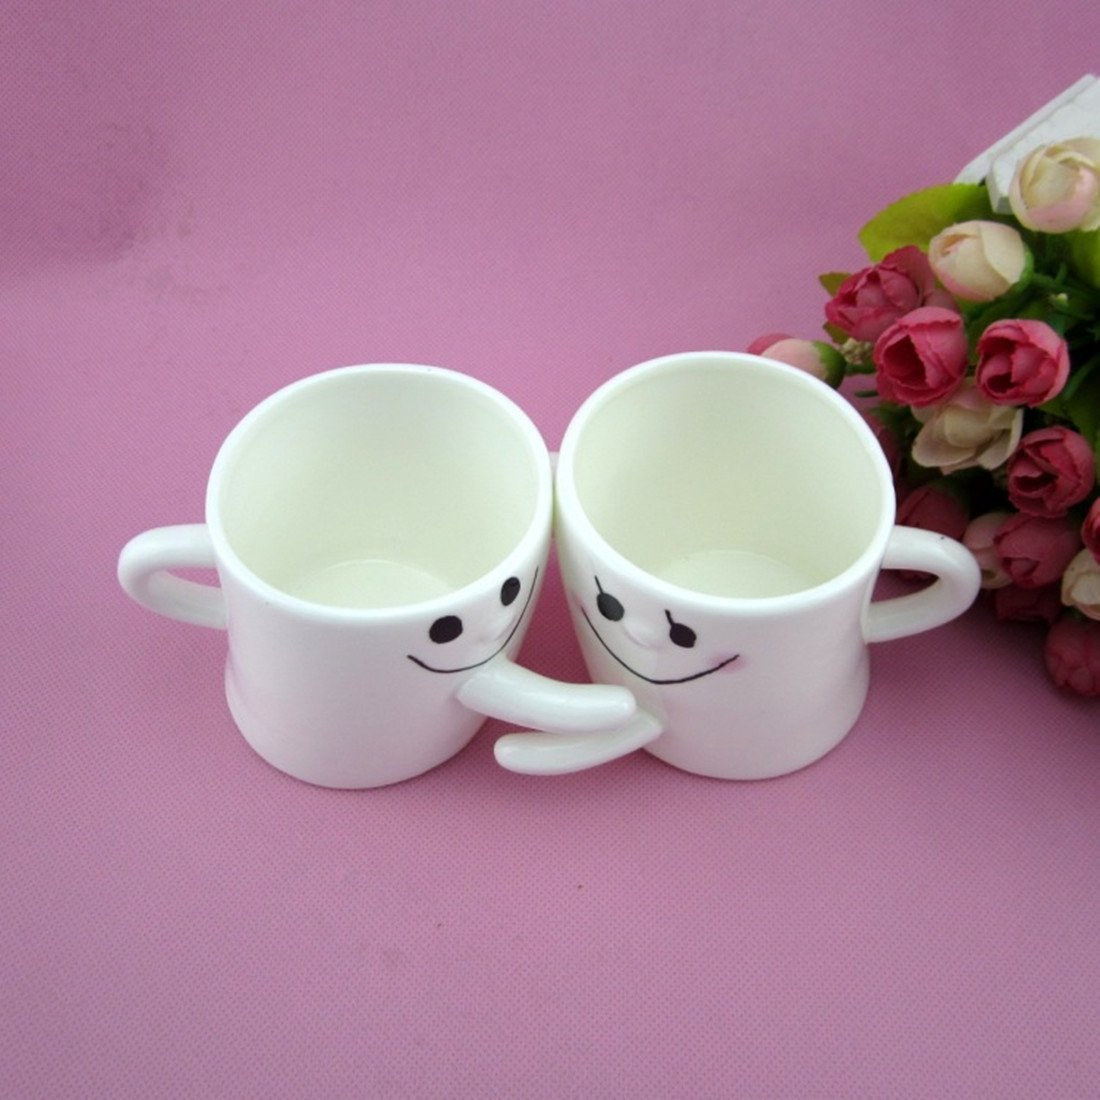 Amazon.com   Lovely 2 Pcs Couple Matching Mug for Coffee Water Juice ...